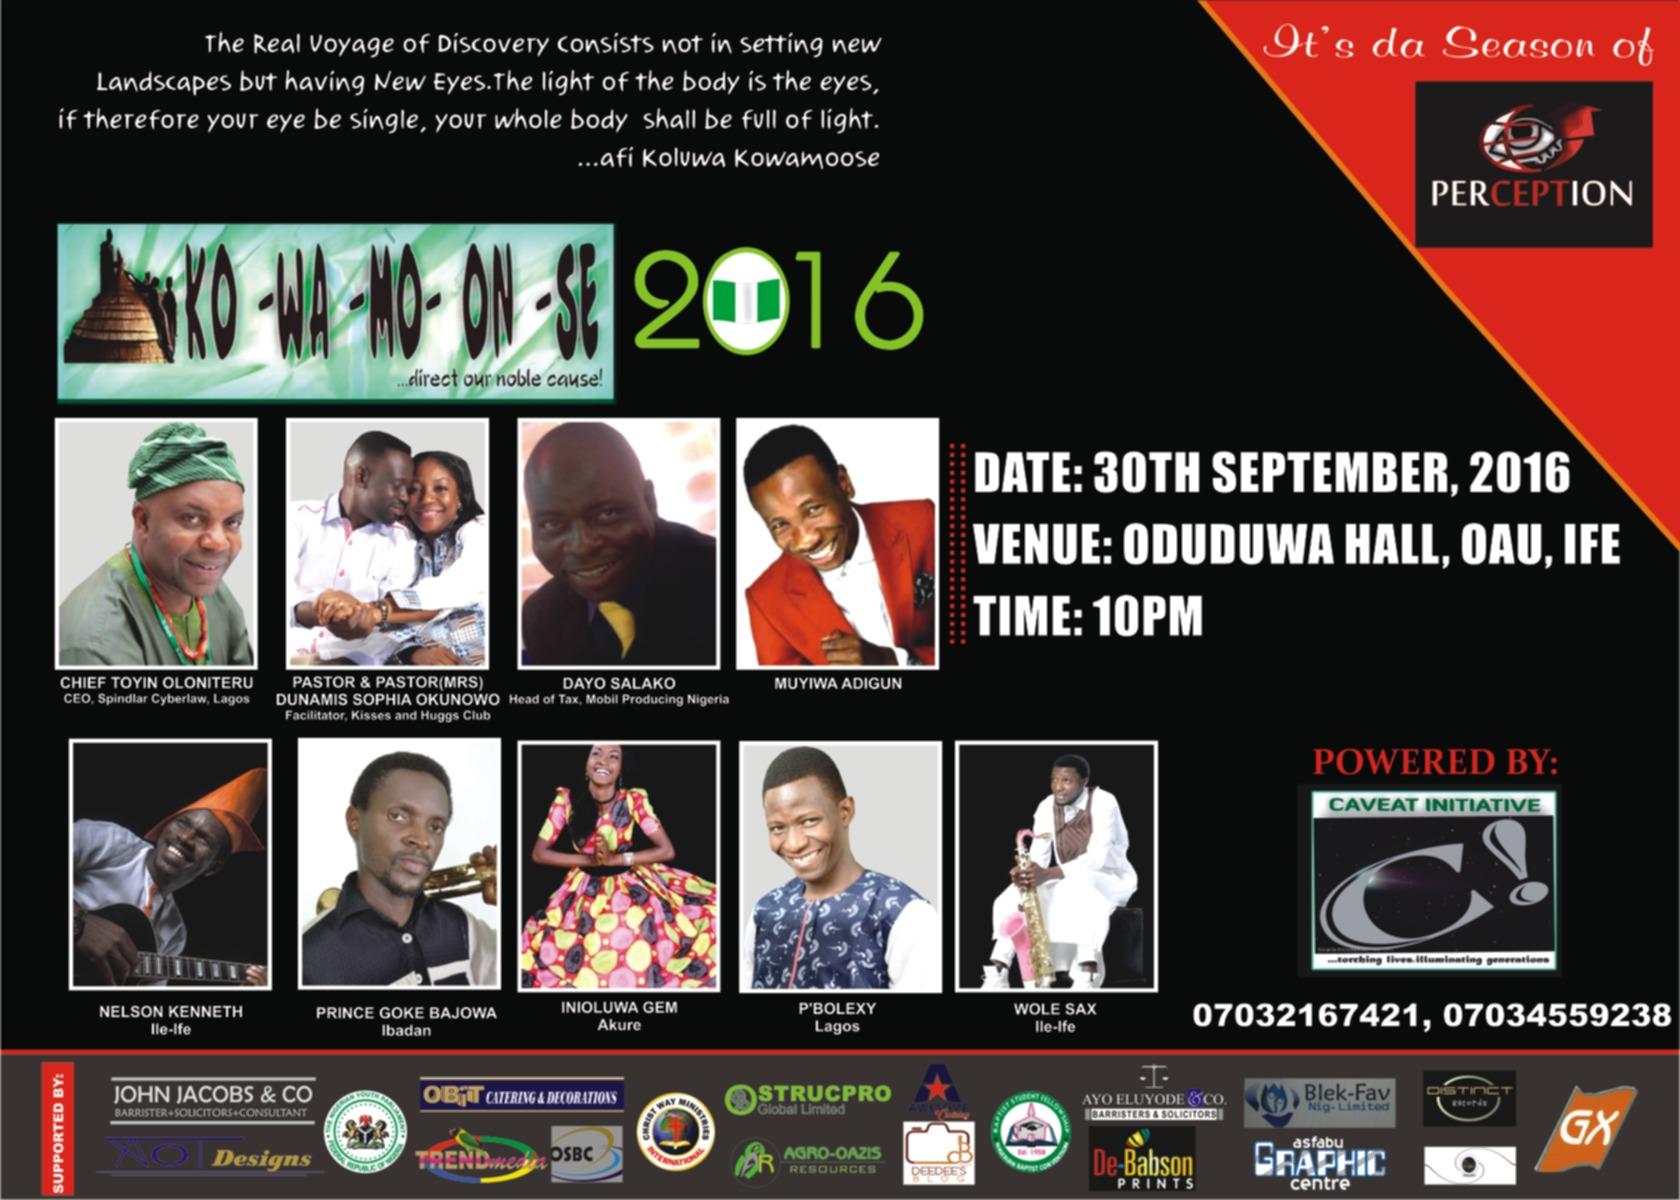 oau-ife-host-2016-edition-kowamoose-perception